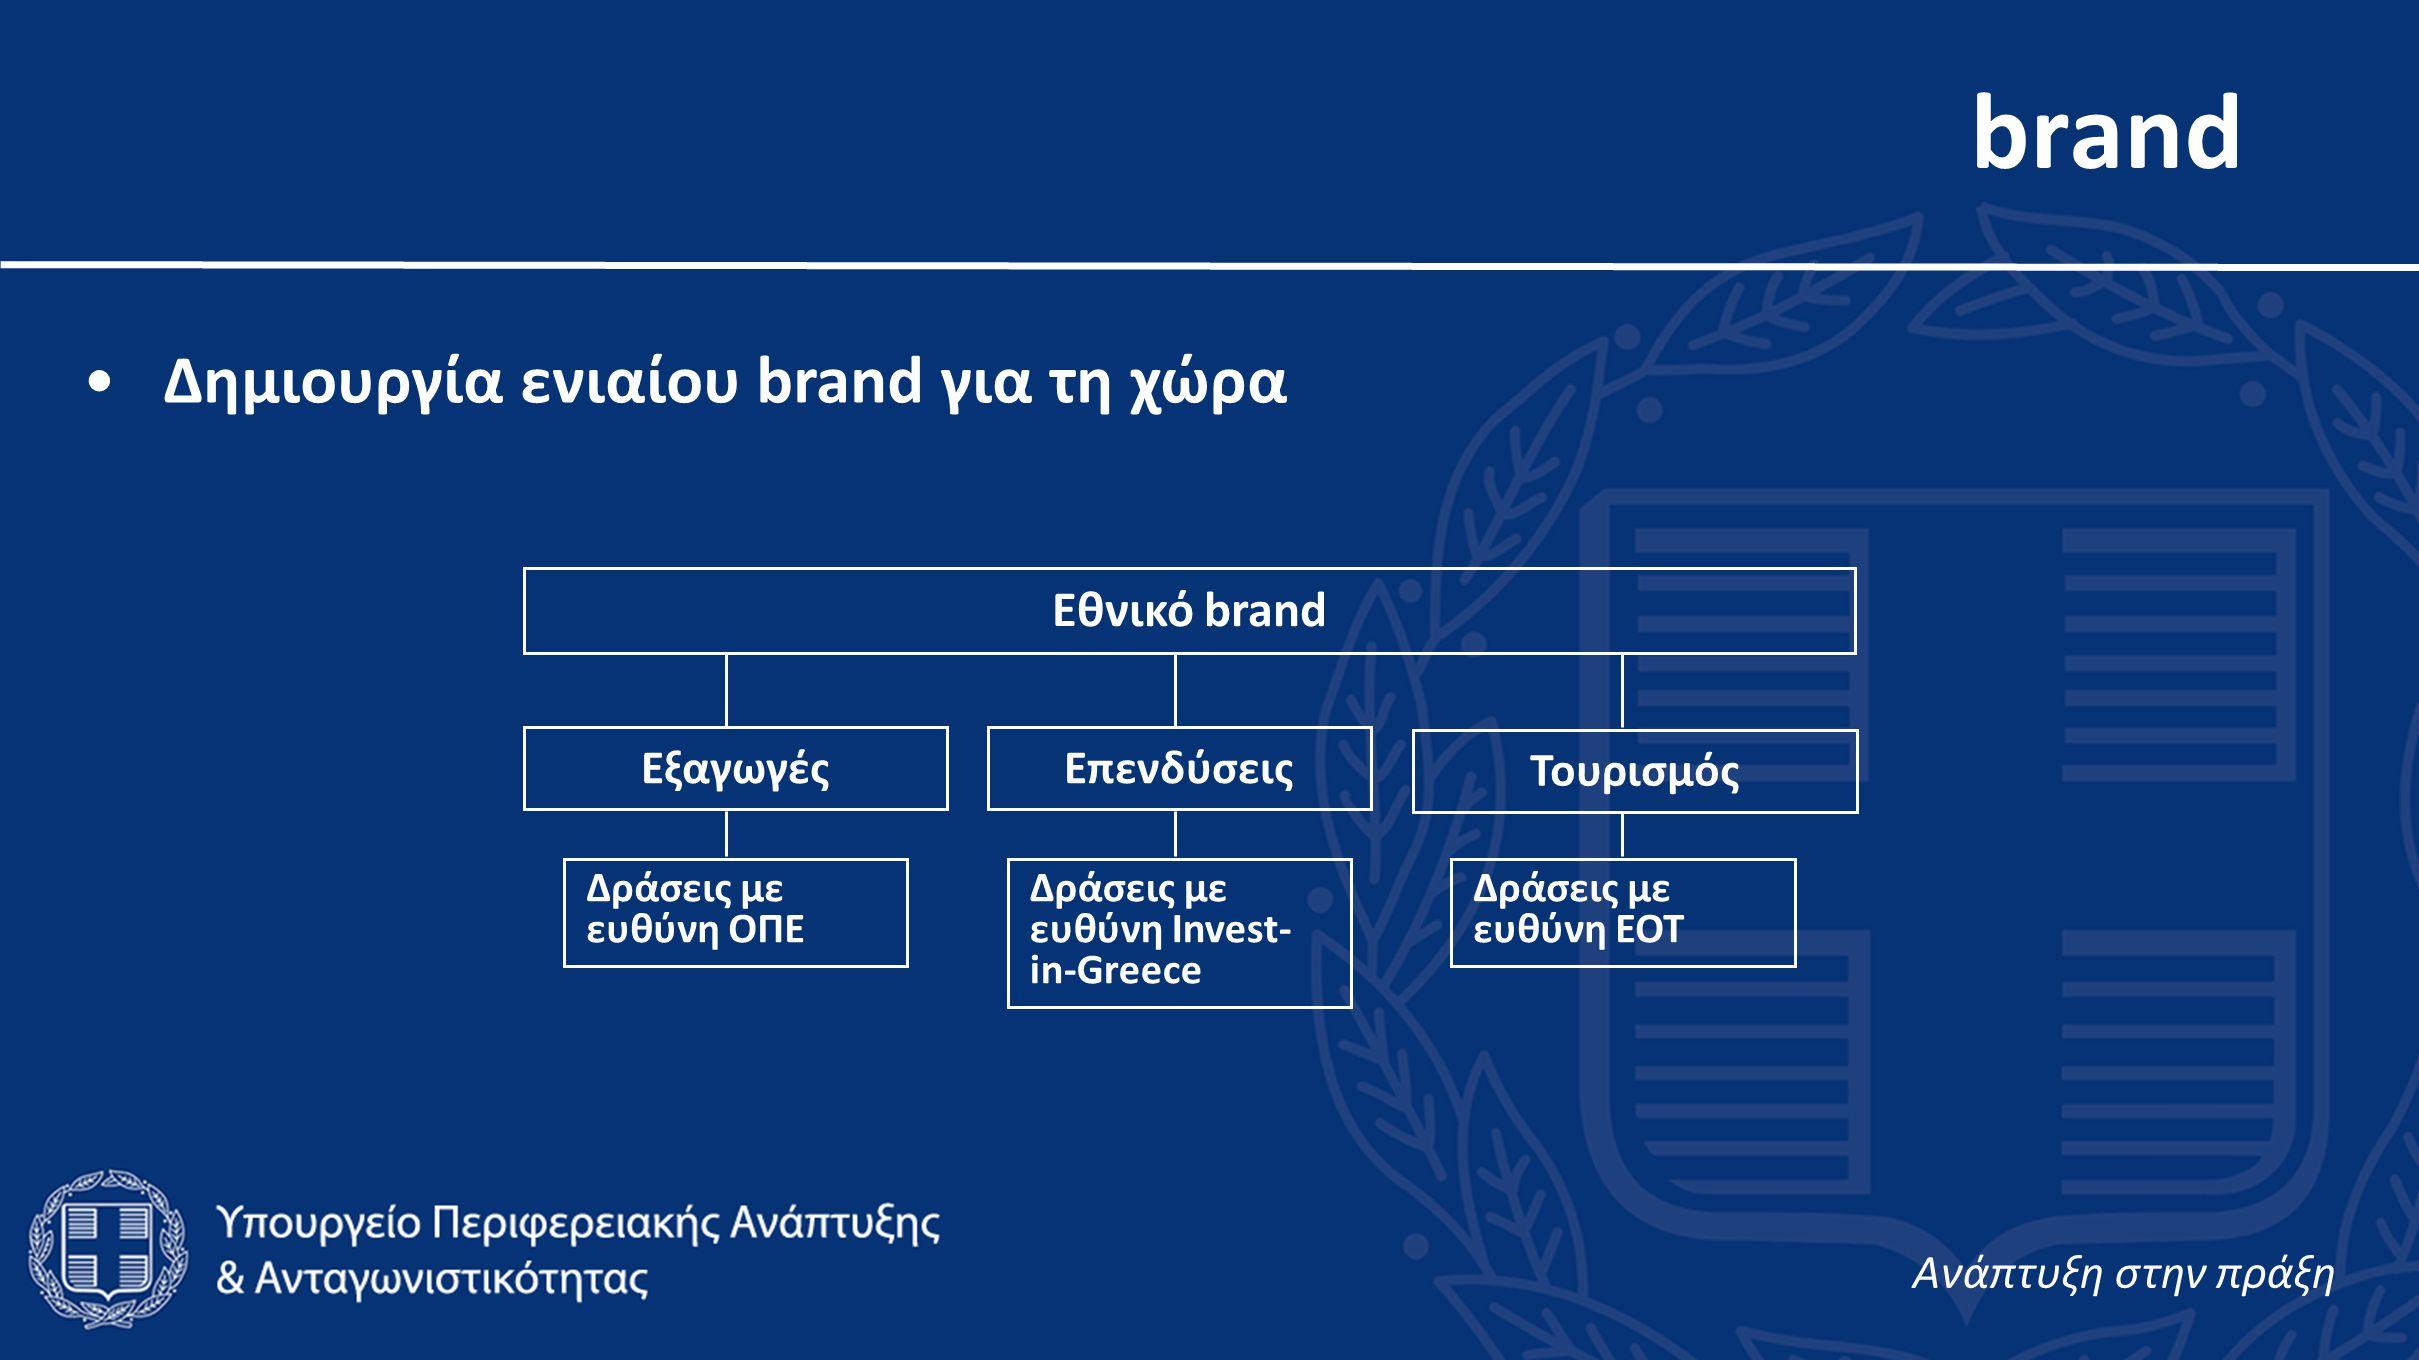 brand •Δημιουργία ενιαίου brand για τη χώρα Εθνικό brand ΕξαγωγέςΕπενδύσεις Τουρισμός Δράσεις με ευθύνη ΟΠΕ Δράσεις με ευθύνη Invest- in-Greece Δράσεις με ευθύνη ΕΟΤ Aνάπτυξη στην πράξη